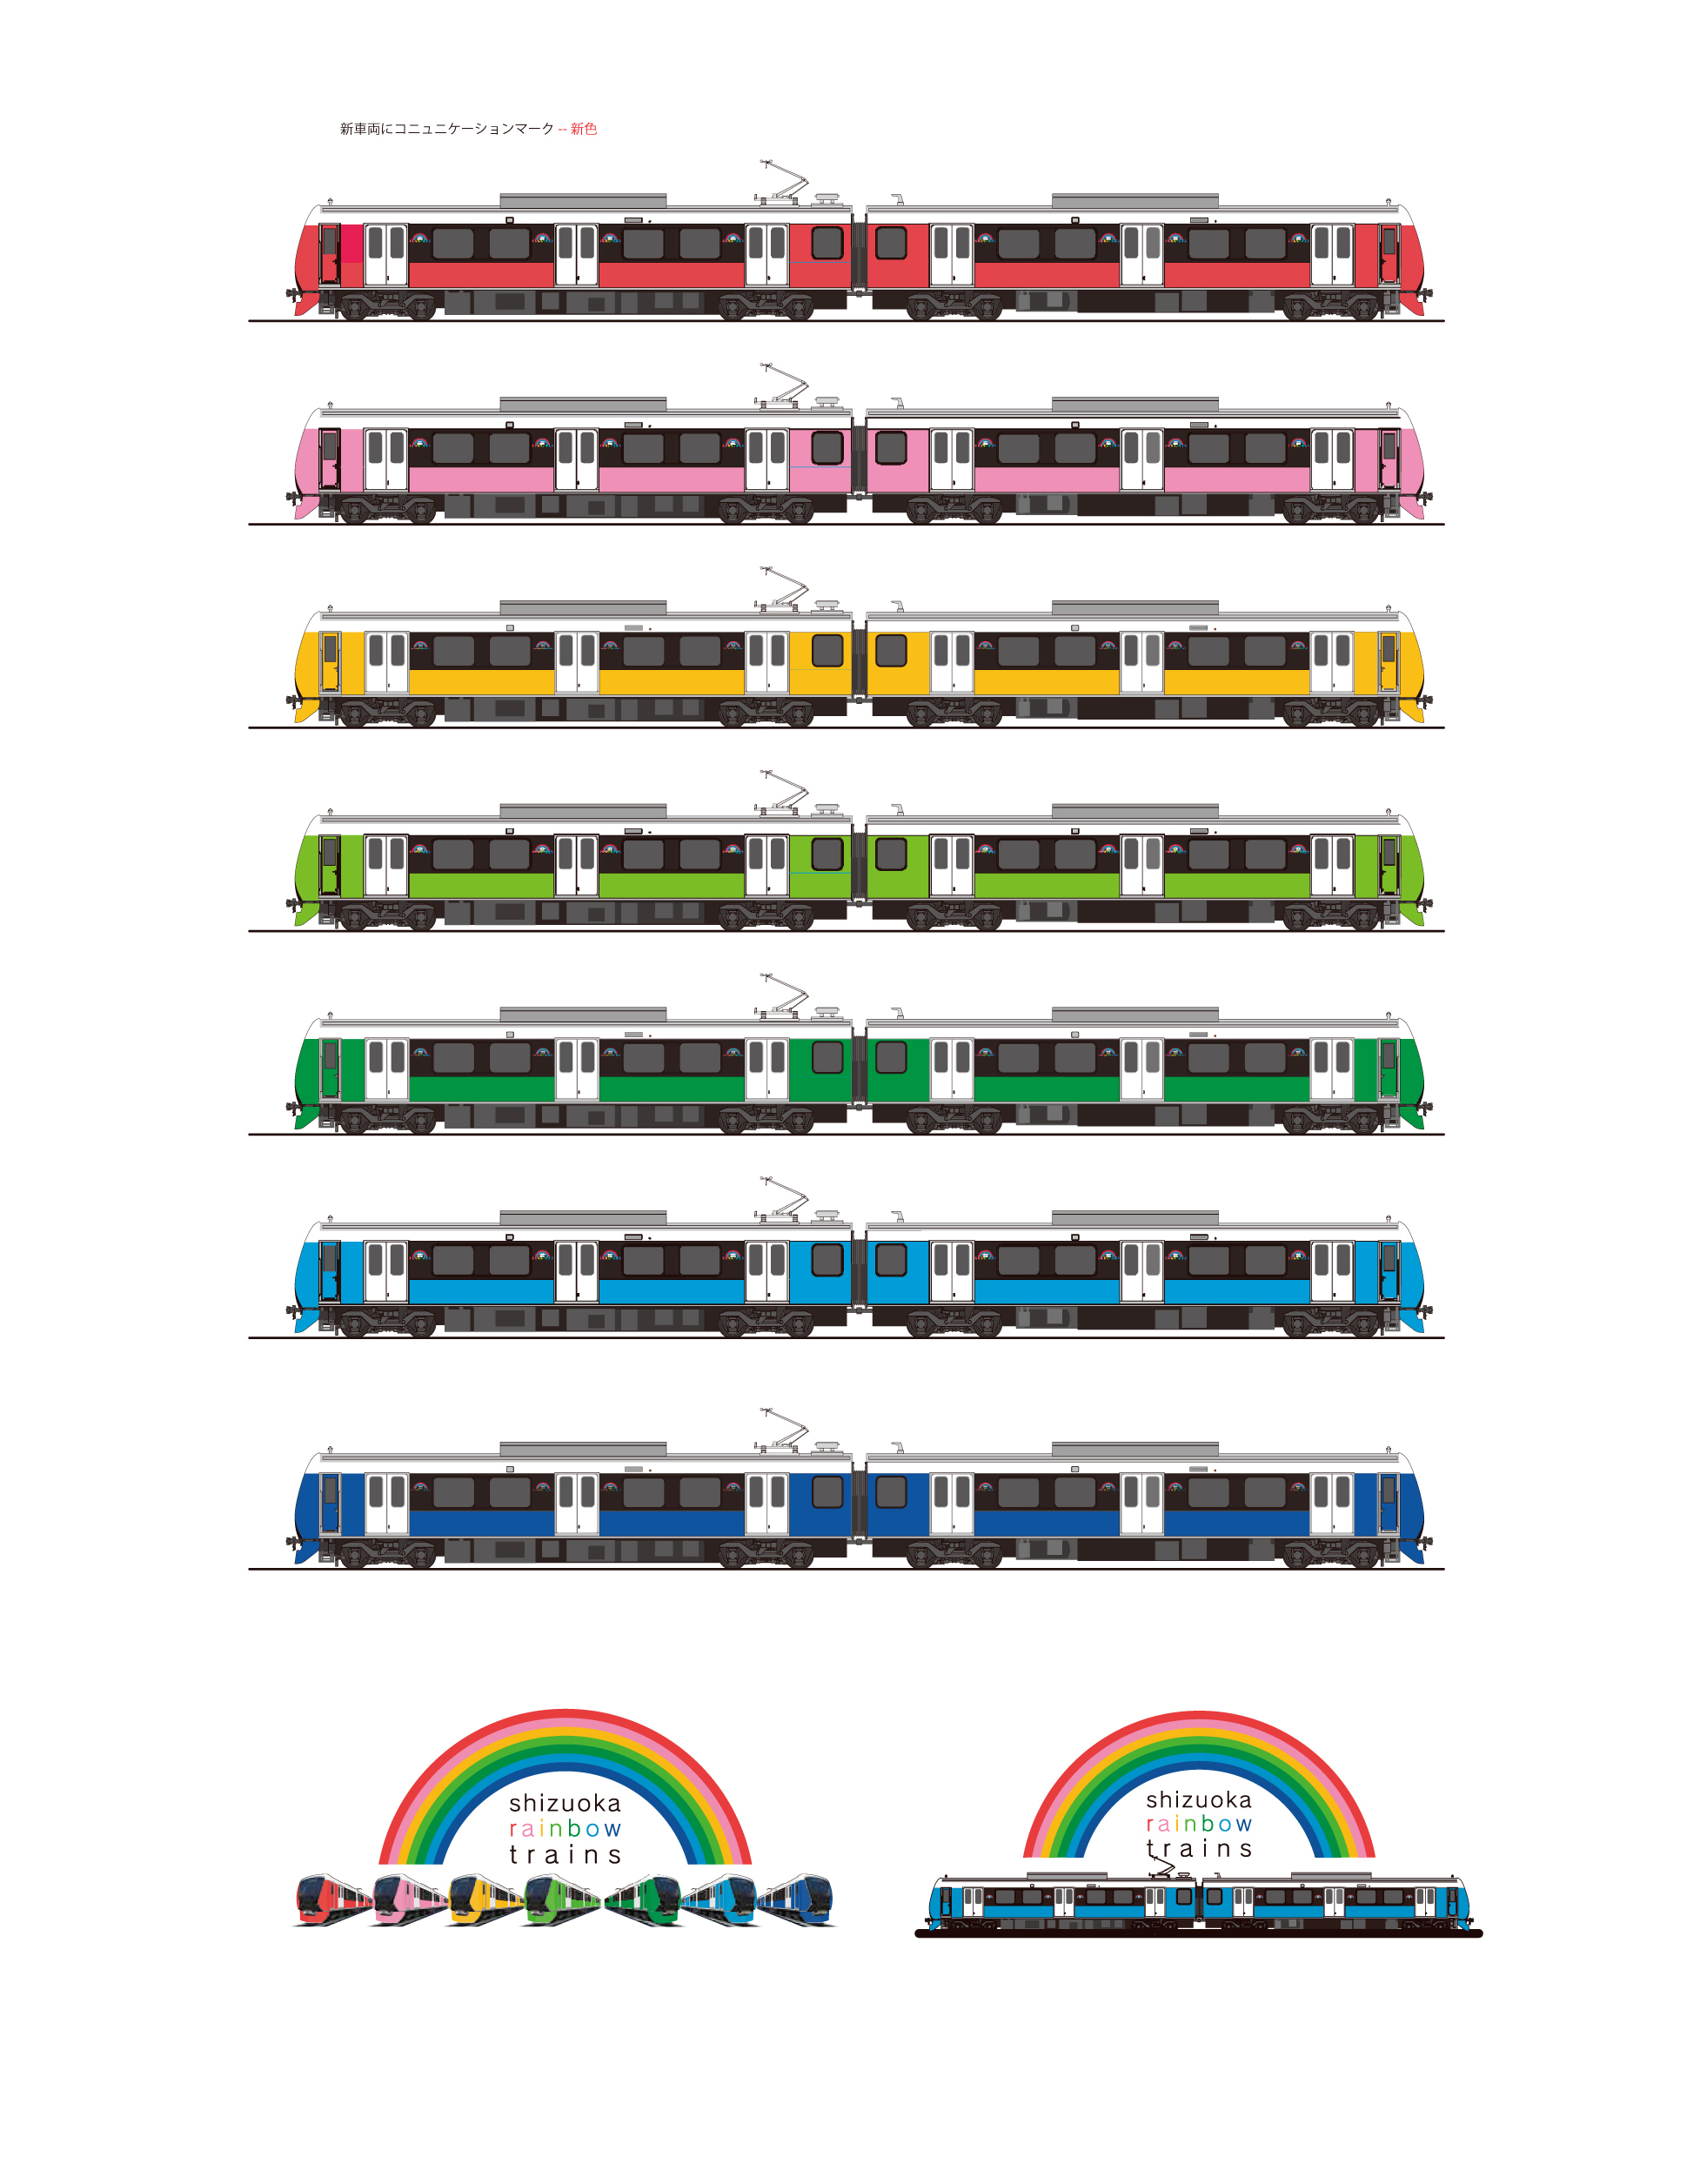 shizuoka rainbow trains |